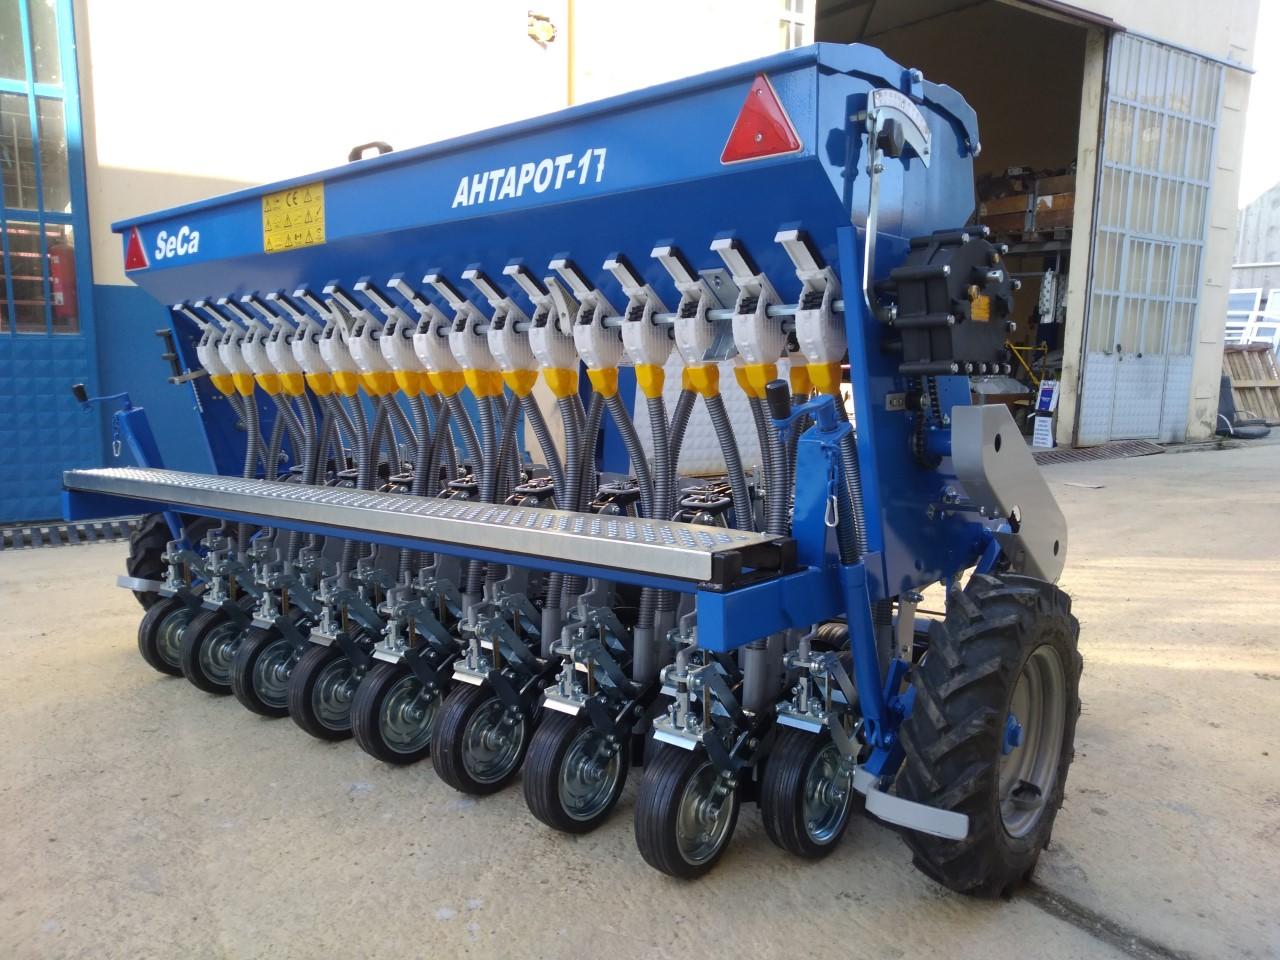 Universal Vegetable Planting Machine (AHTAPOT-17)